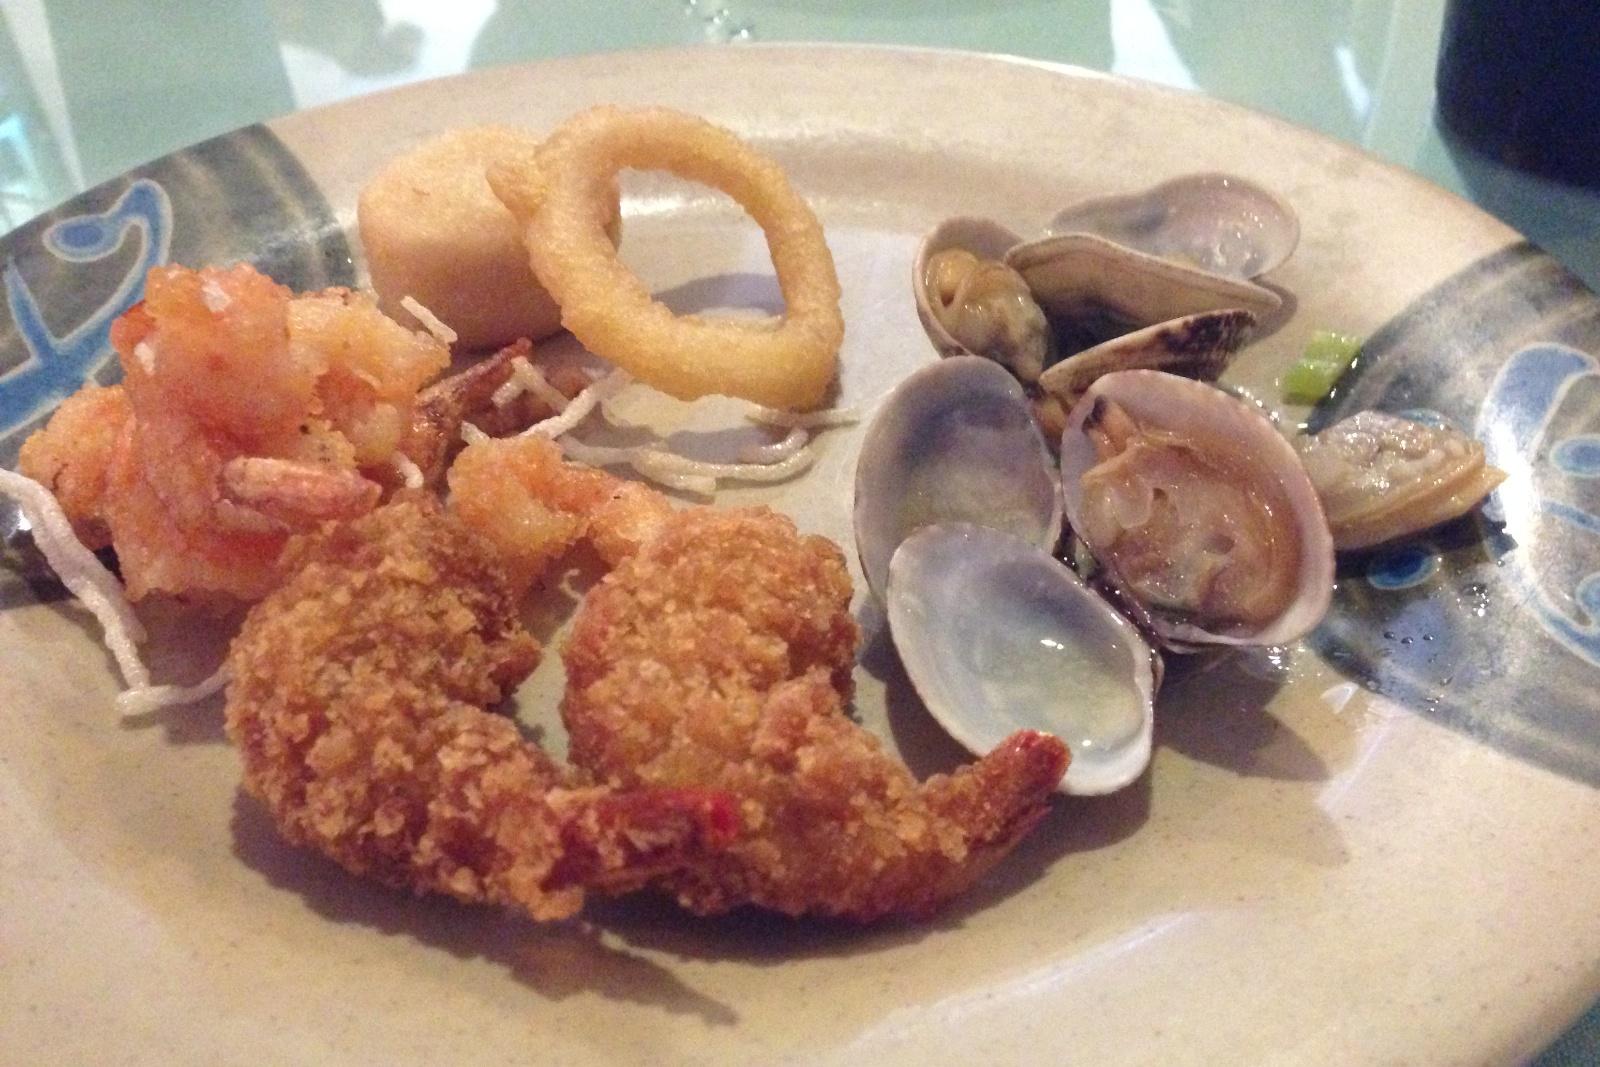 http://blog.rickk.com/food/2014/09/15/ate.2014.09.14.d2.jpg